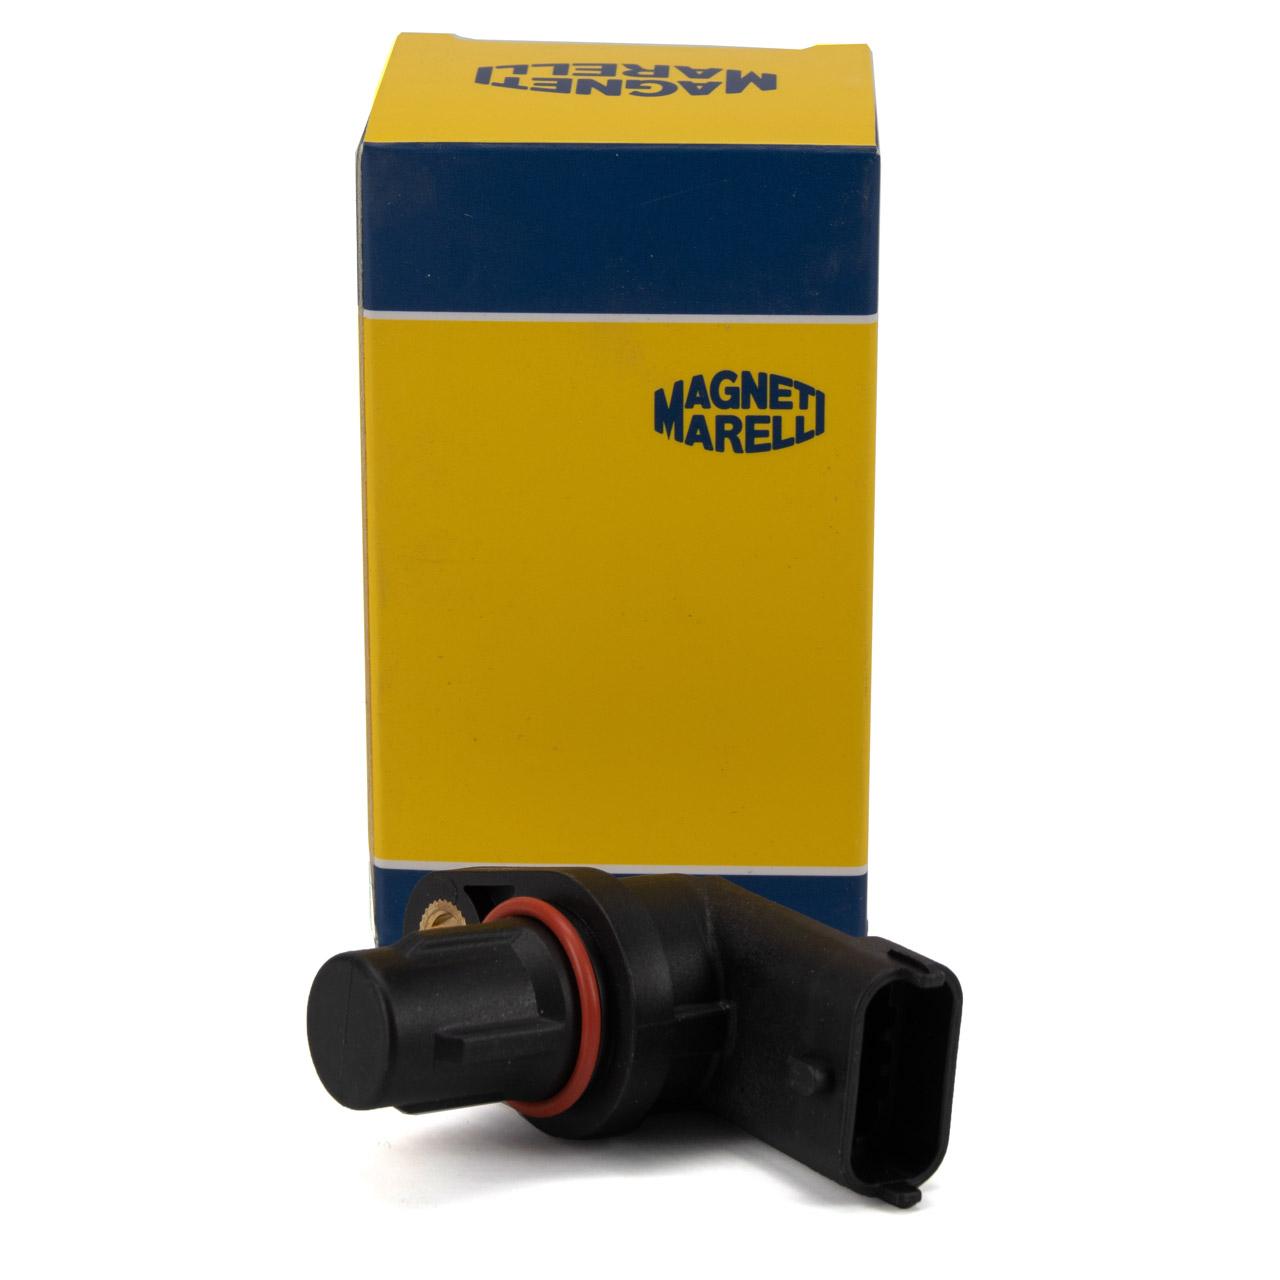 MAGNETI MARELLI Nockenwellensensor OPEL Agila Astra G H J Corsa C D Insignia A 6235685